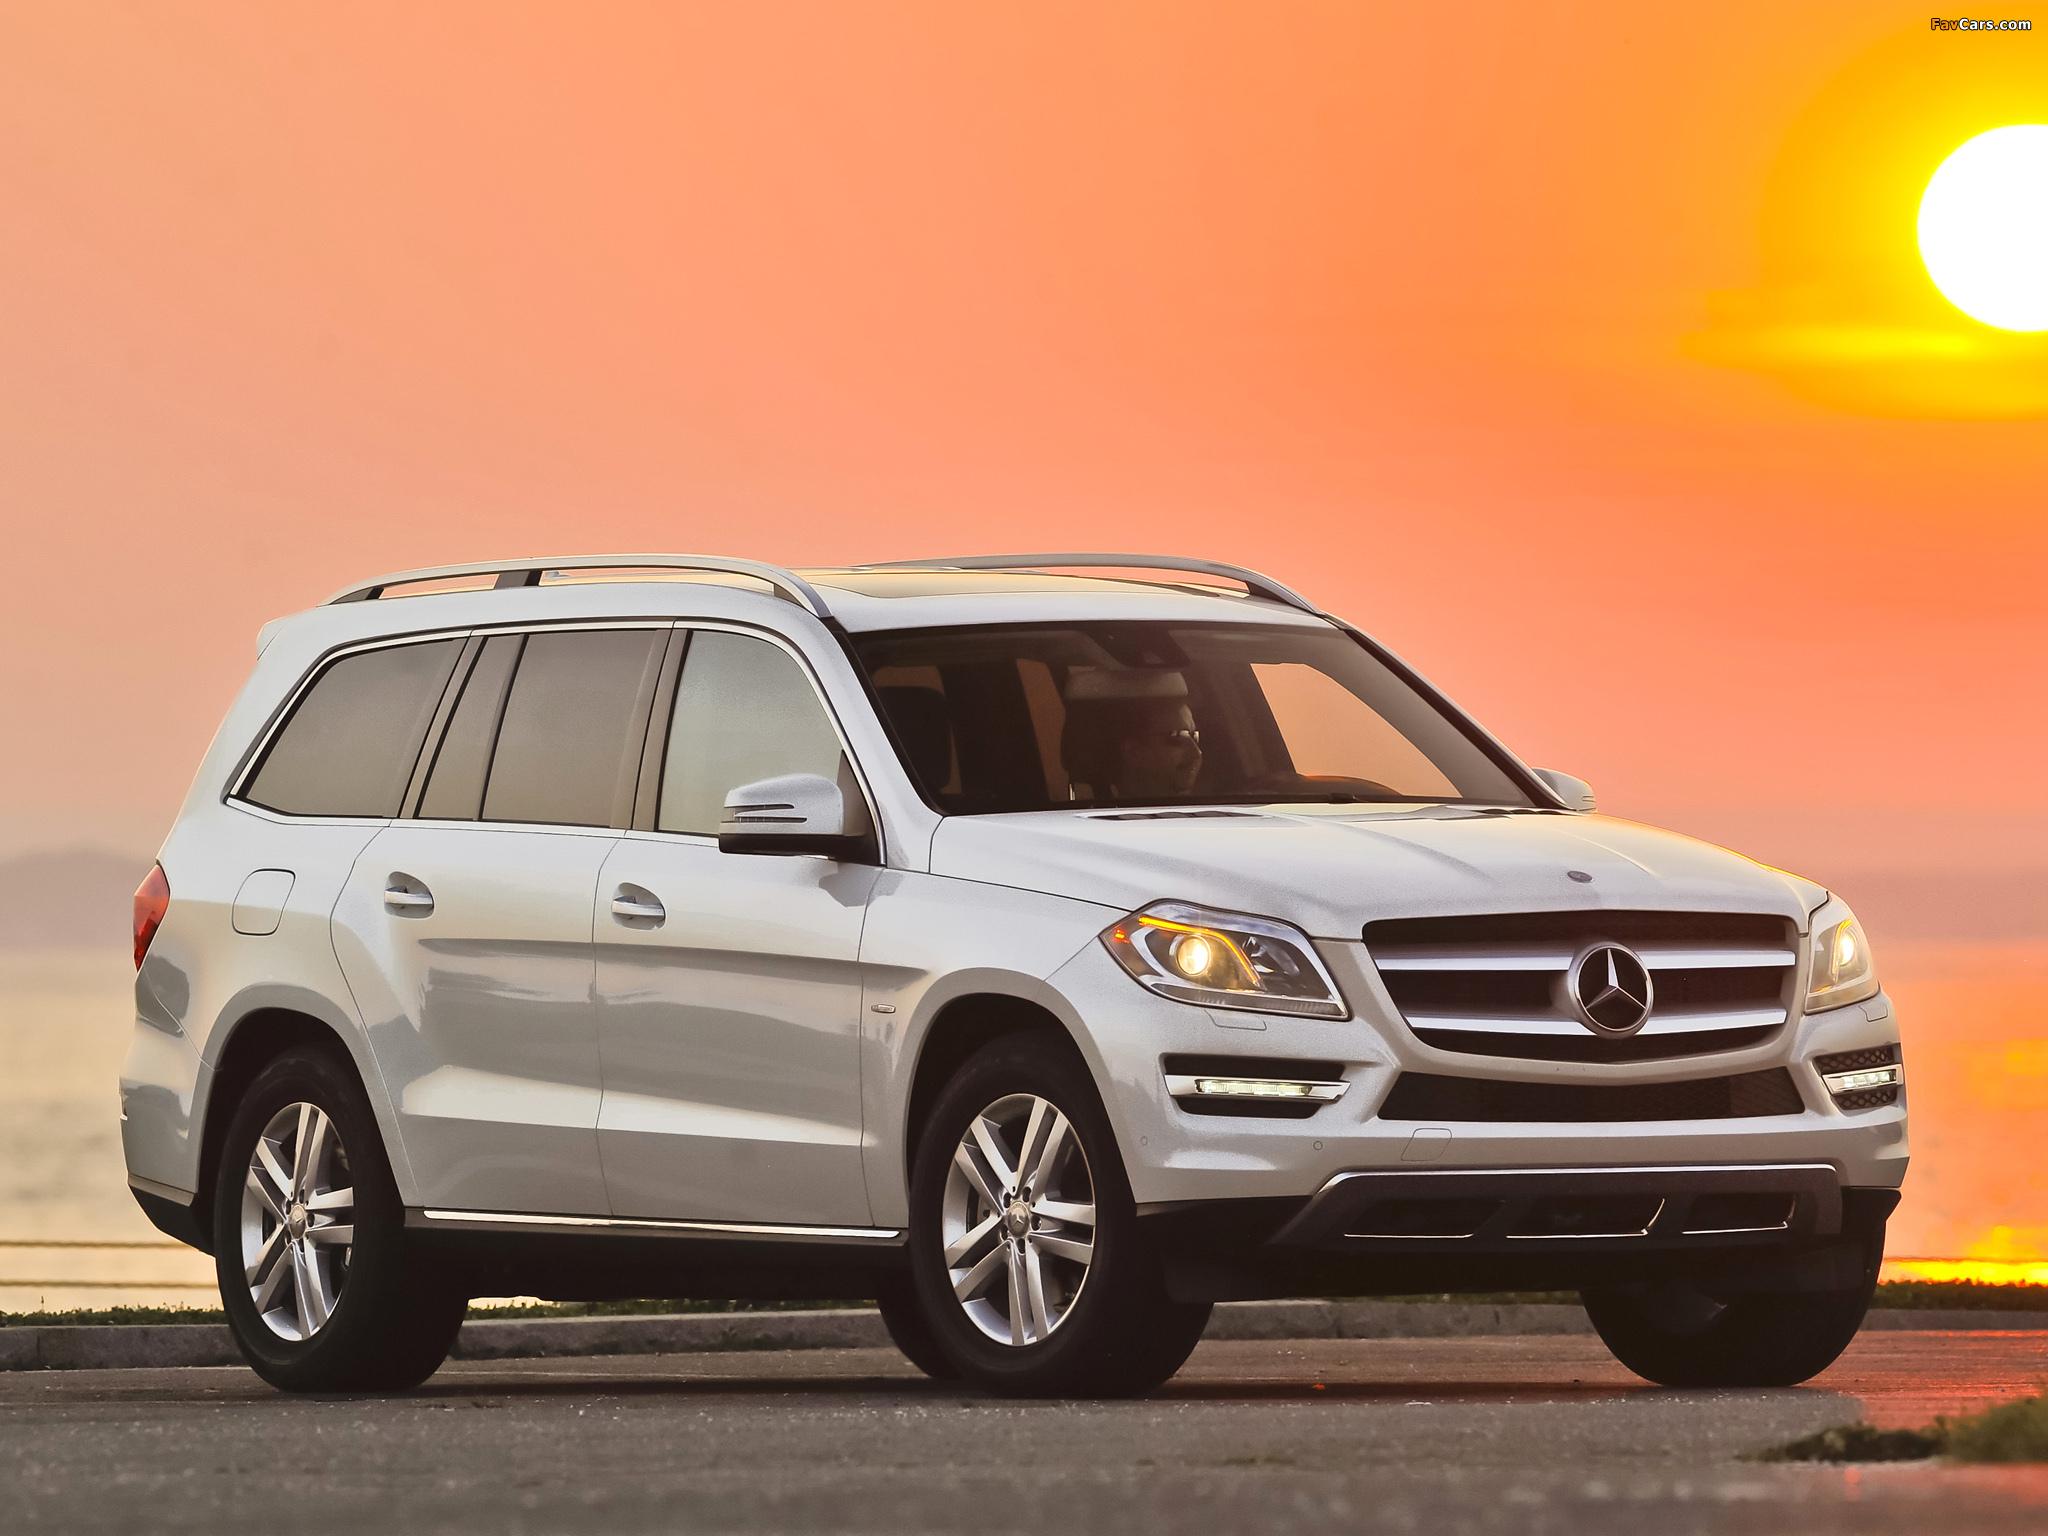 Mercedes benz gl 350 bluetec us spec x166 2012 images for Mercedes benz navigation free download